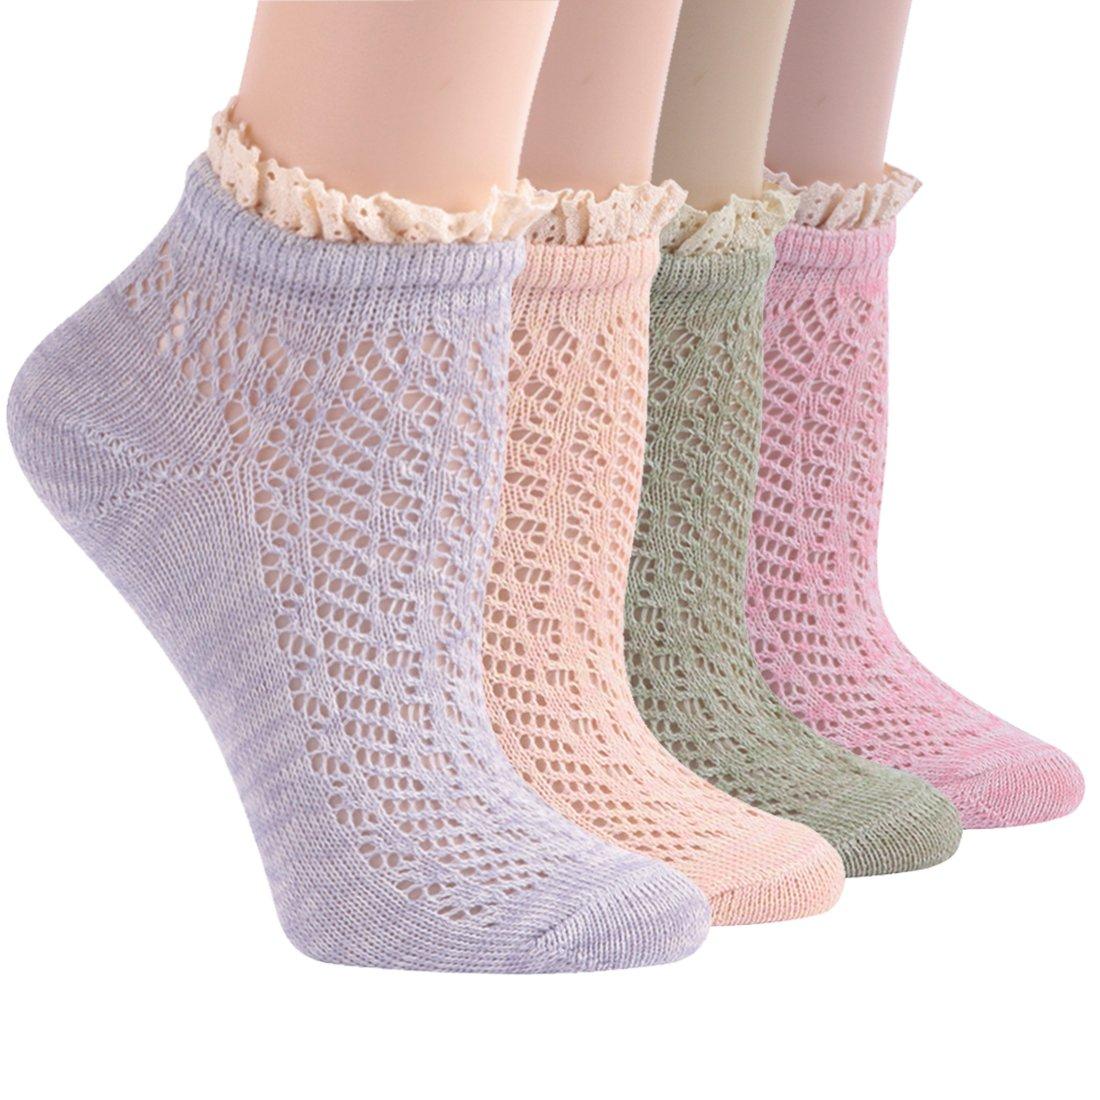 Lady's Lace Socks, Socks Daze 4 Pack Elegant Crochet Lace Trim Cotton Knit Crew Socks for Summer